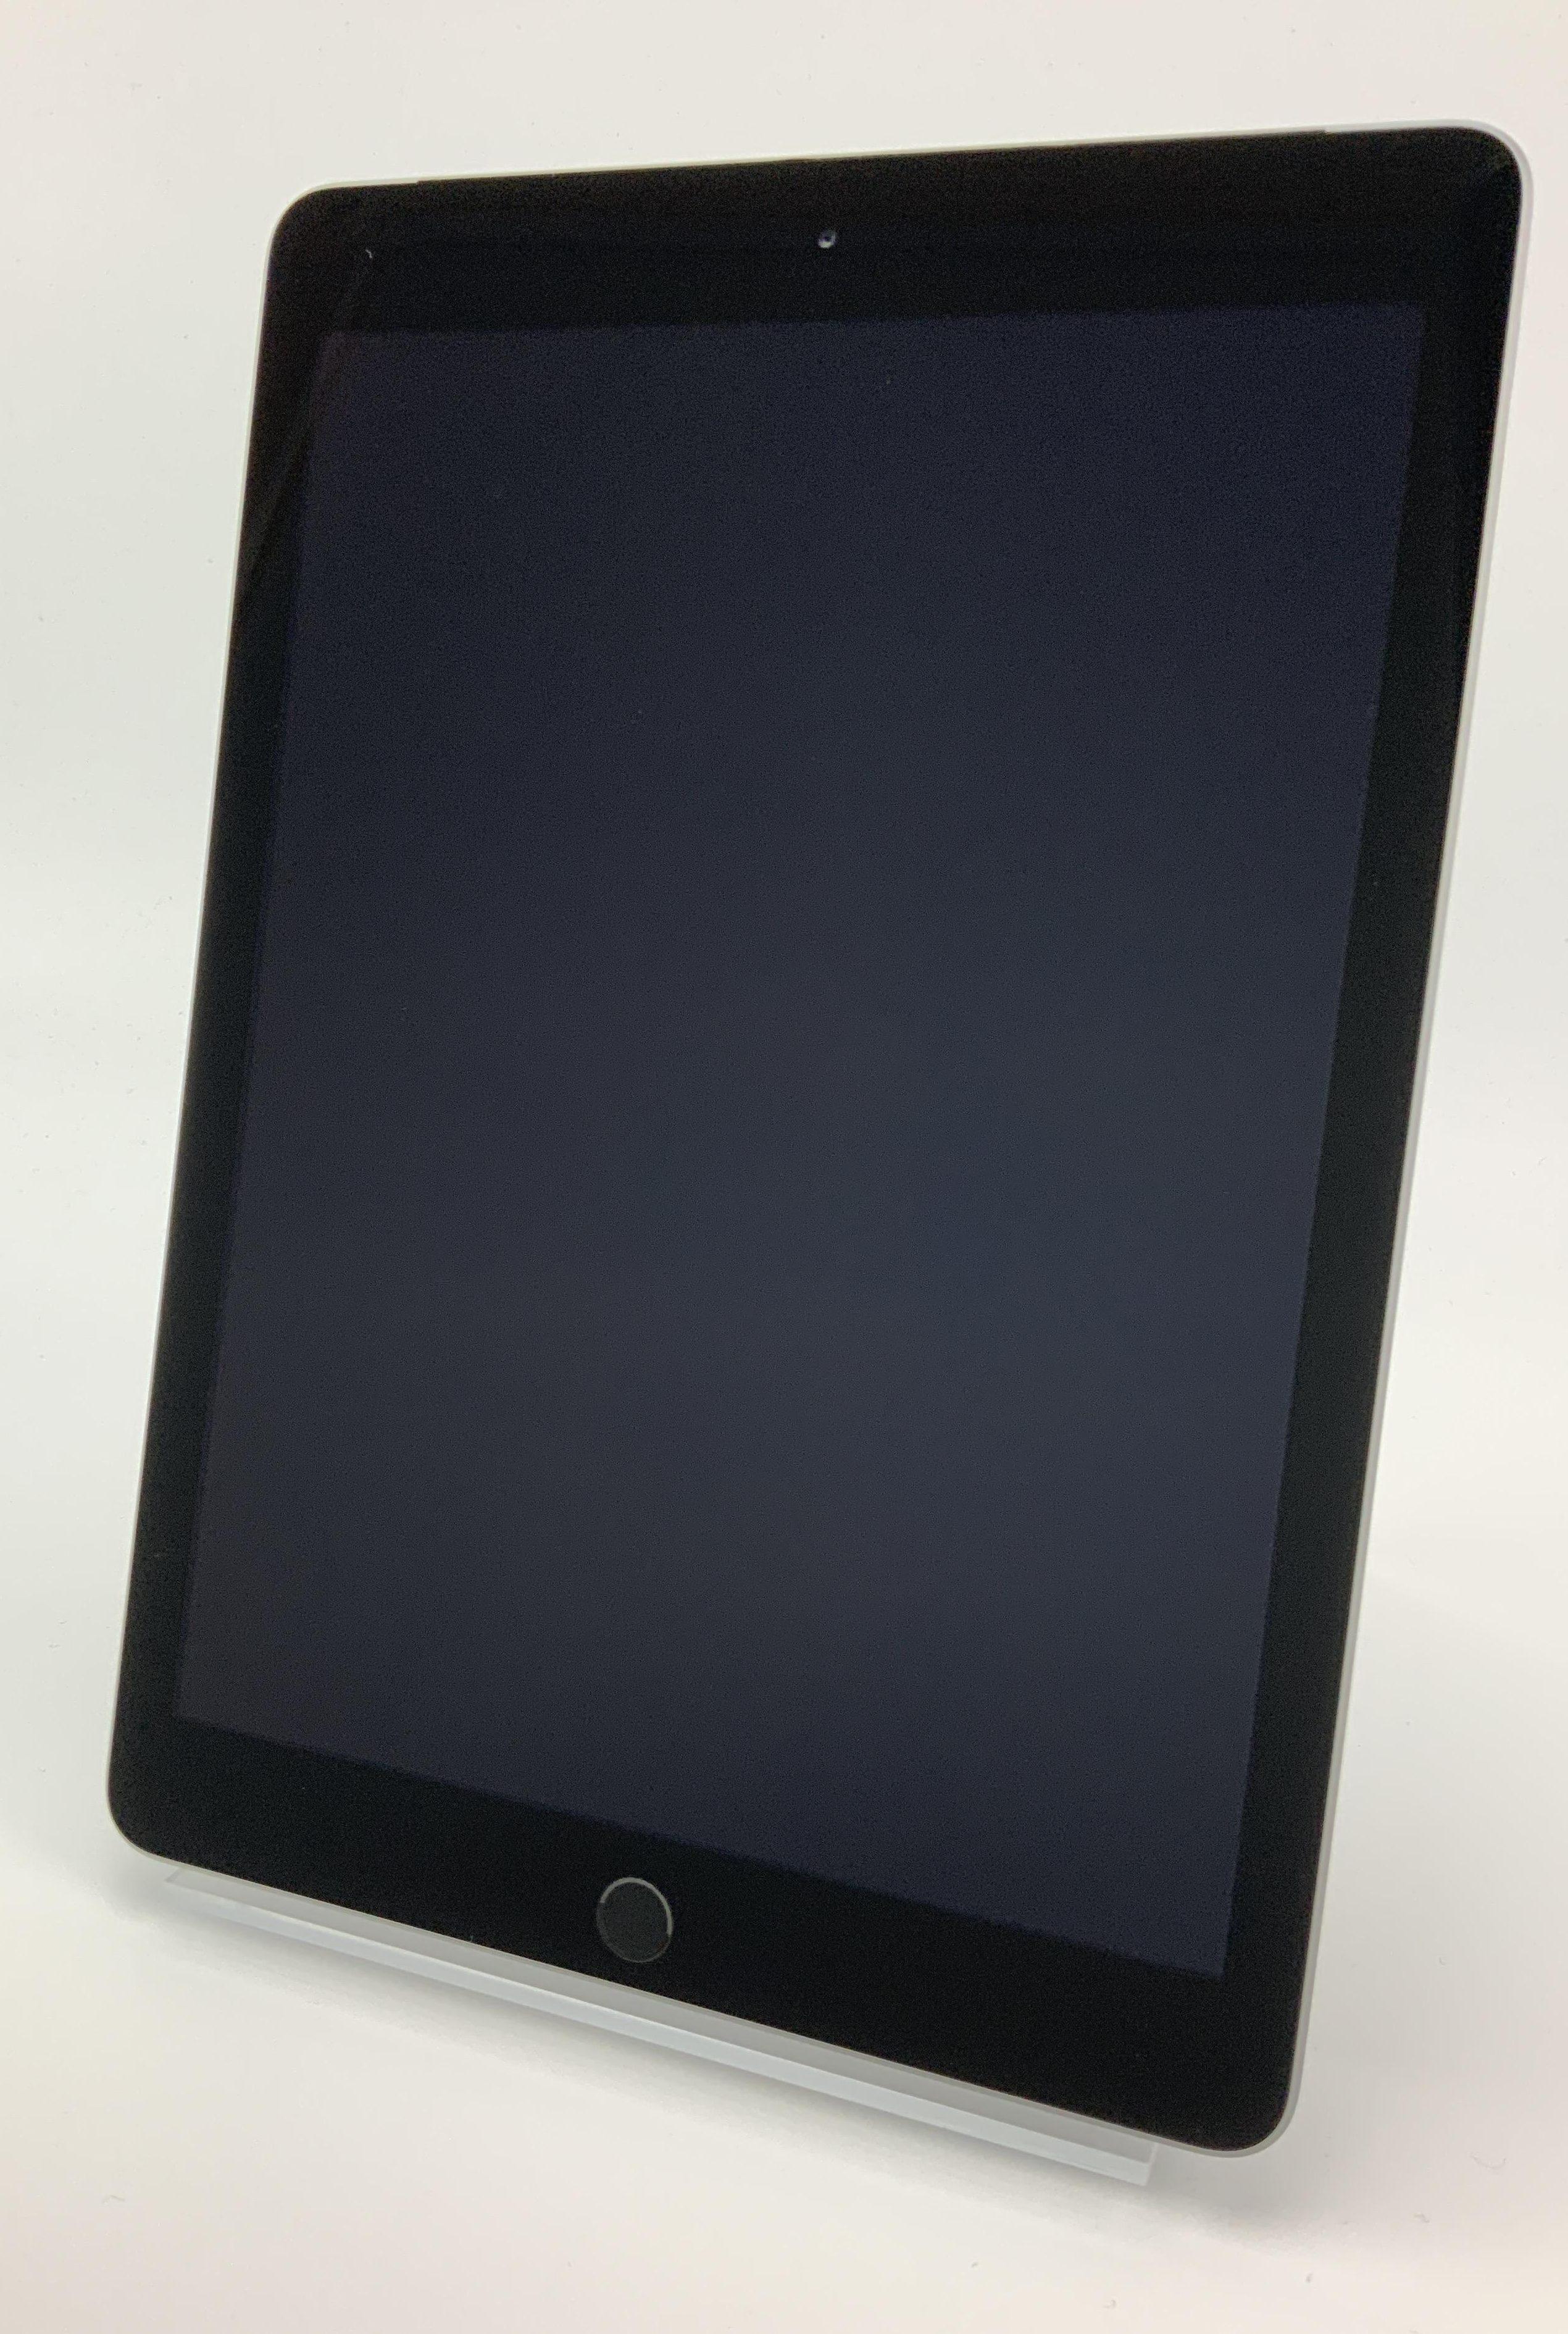 iPad 5 Wi-Fi + Cellular 32GB, 32GB, Space Gray, Bild 2